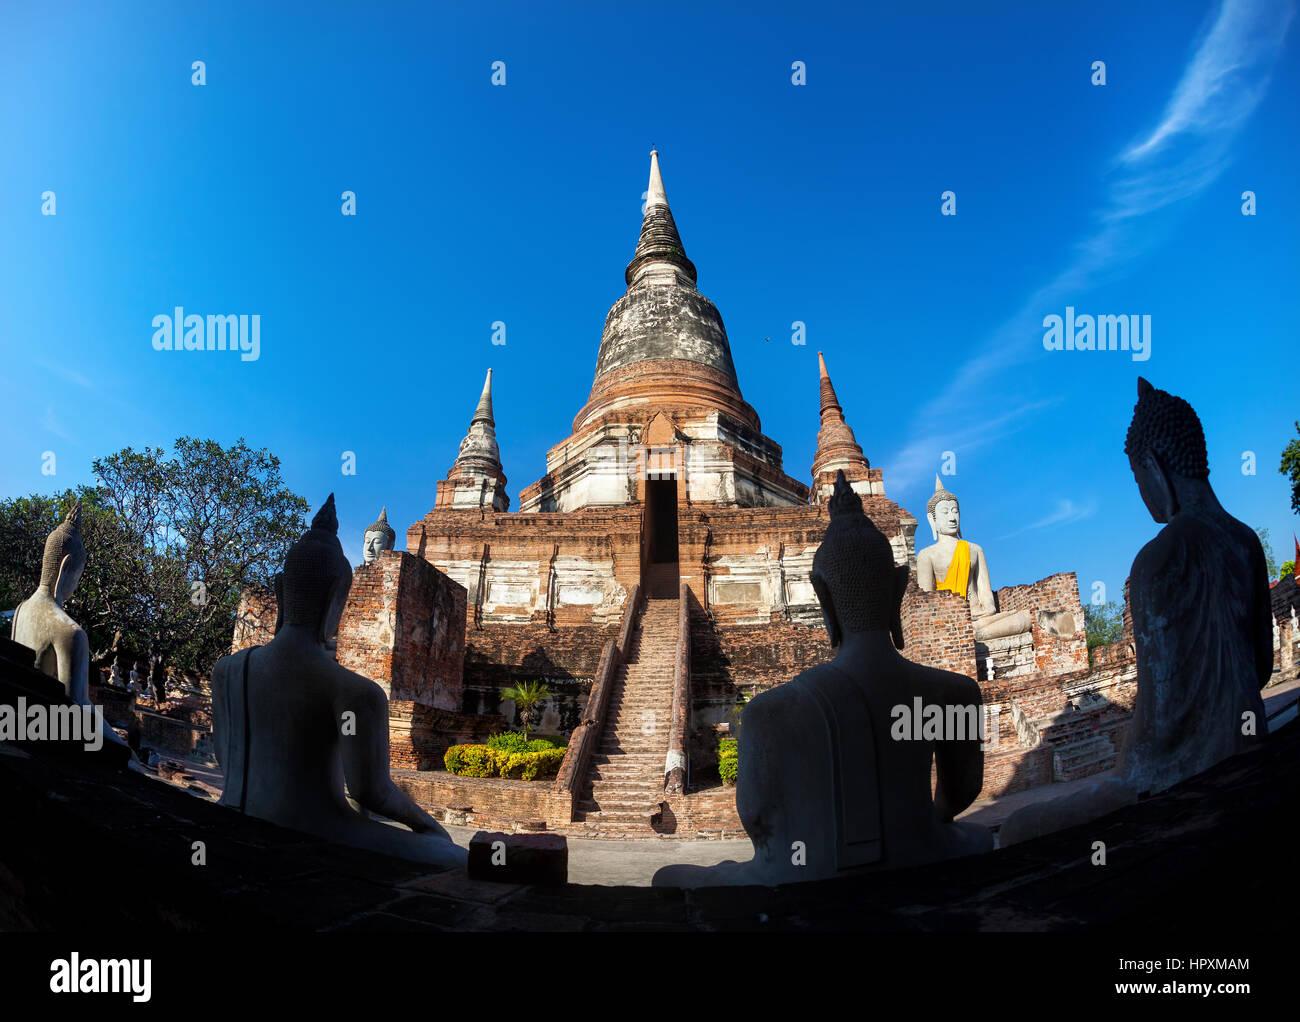 Big Stupa and Buddha statues in Wat Yai Chai Mongkol monastery in Ayuttaya, Thailand - Stock Image